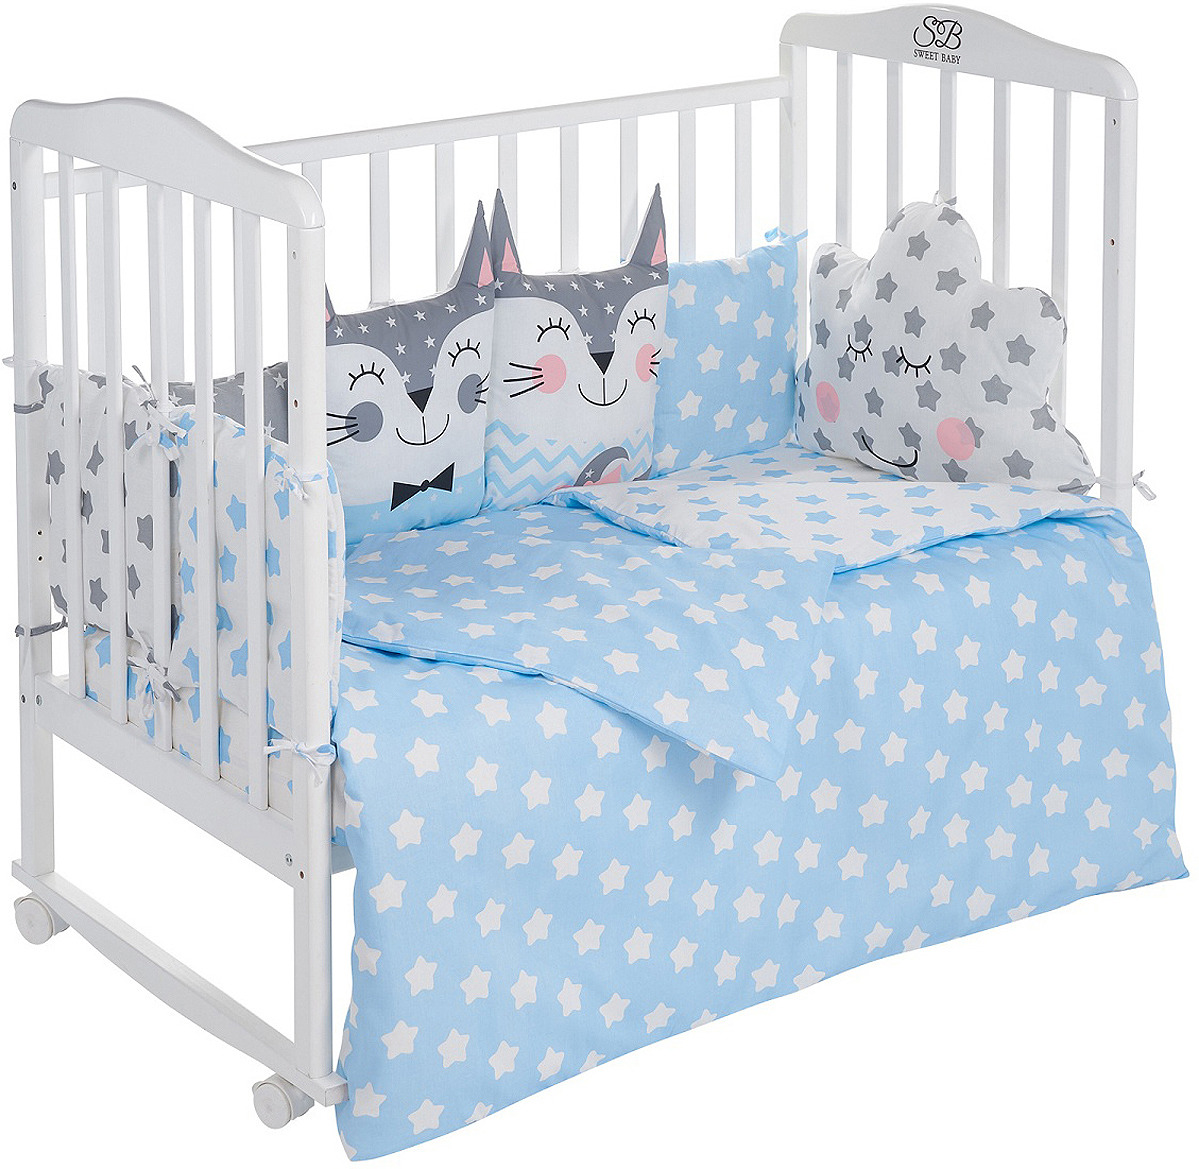 цена Комплект в кроватку Sweet Baby Gioia Blu, 423284, голубой, 4 предмета онлайн в 2017 году